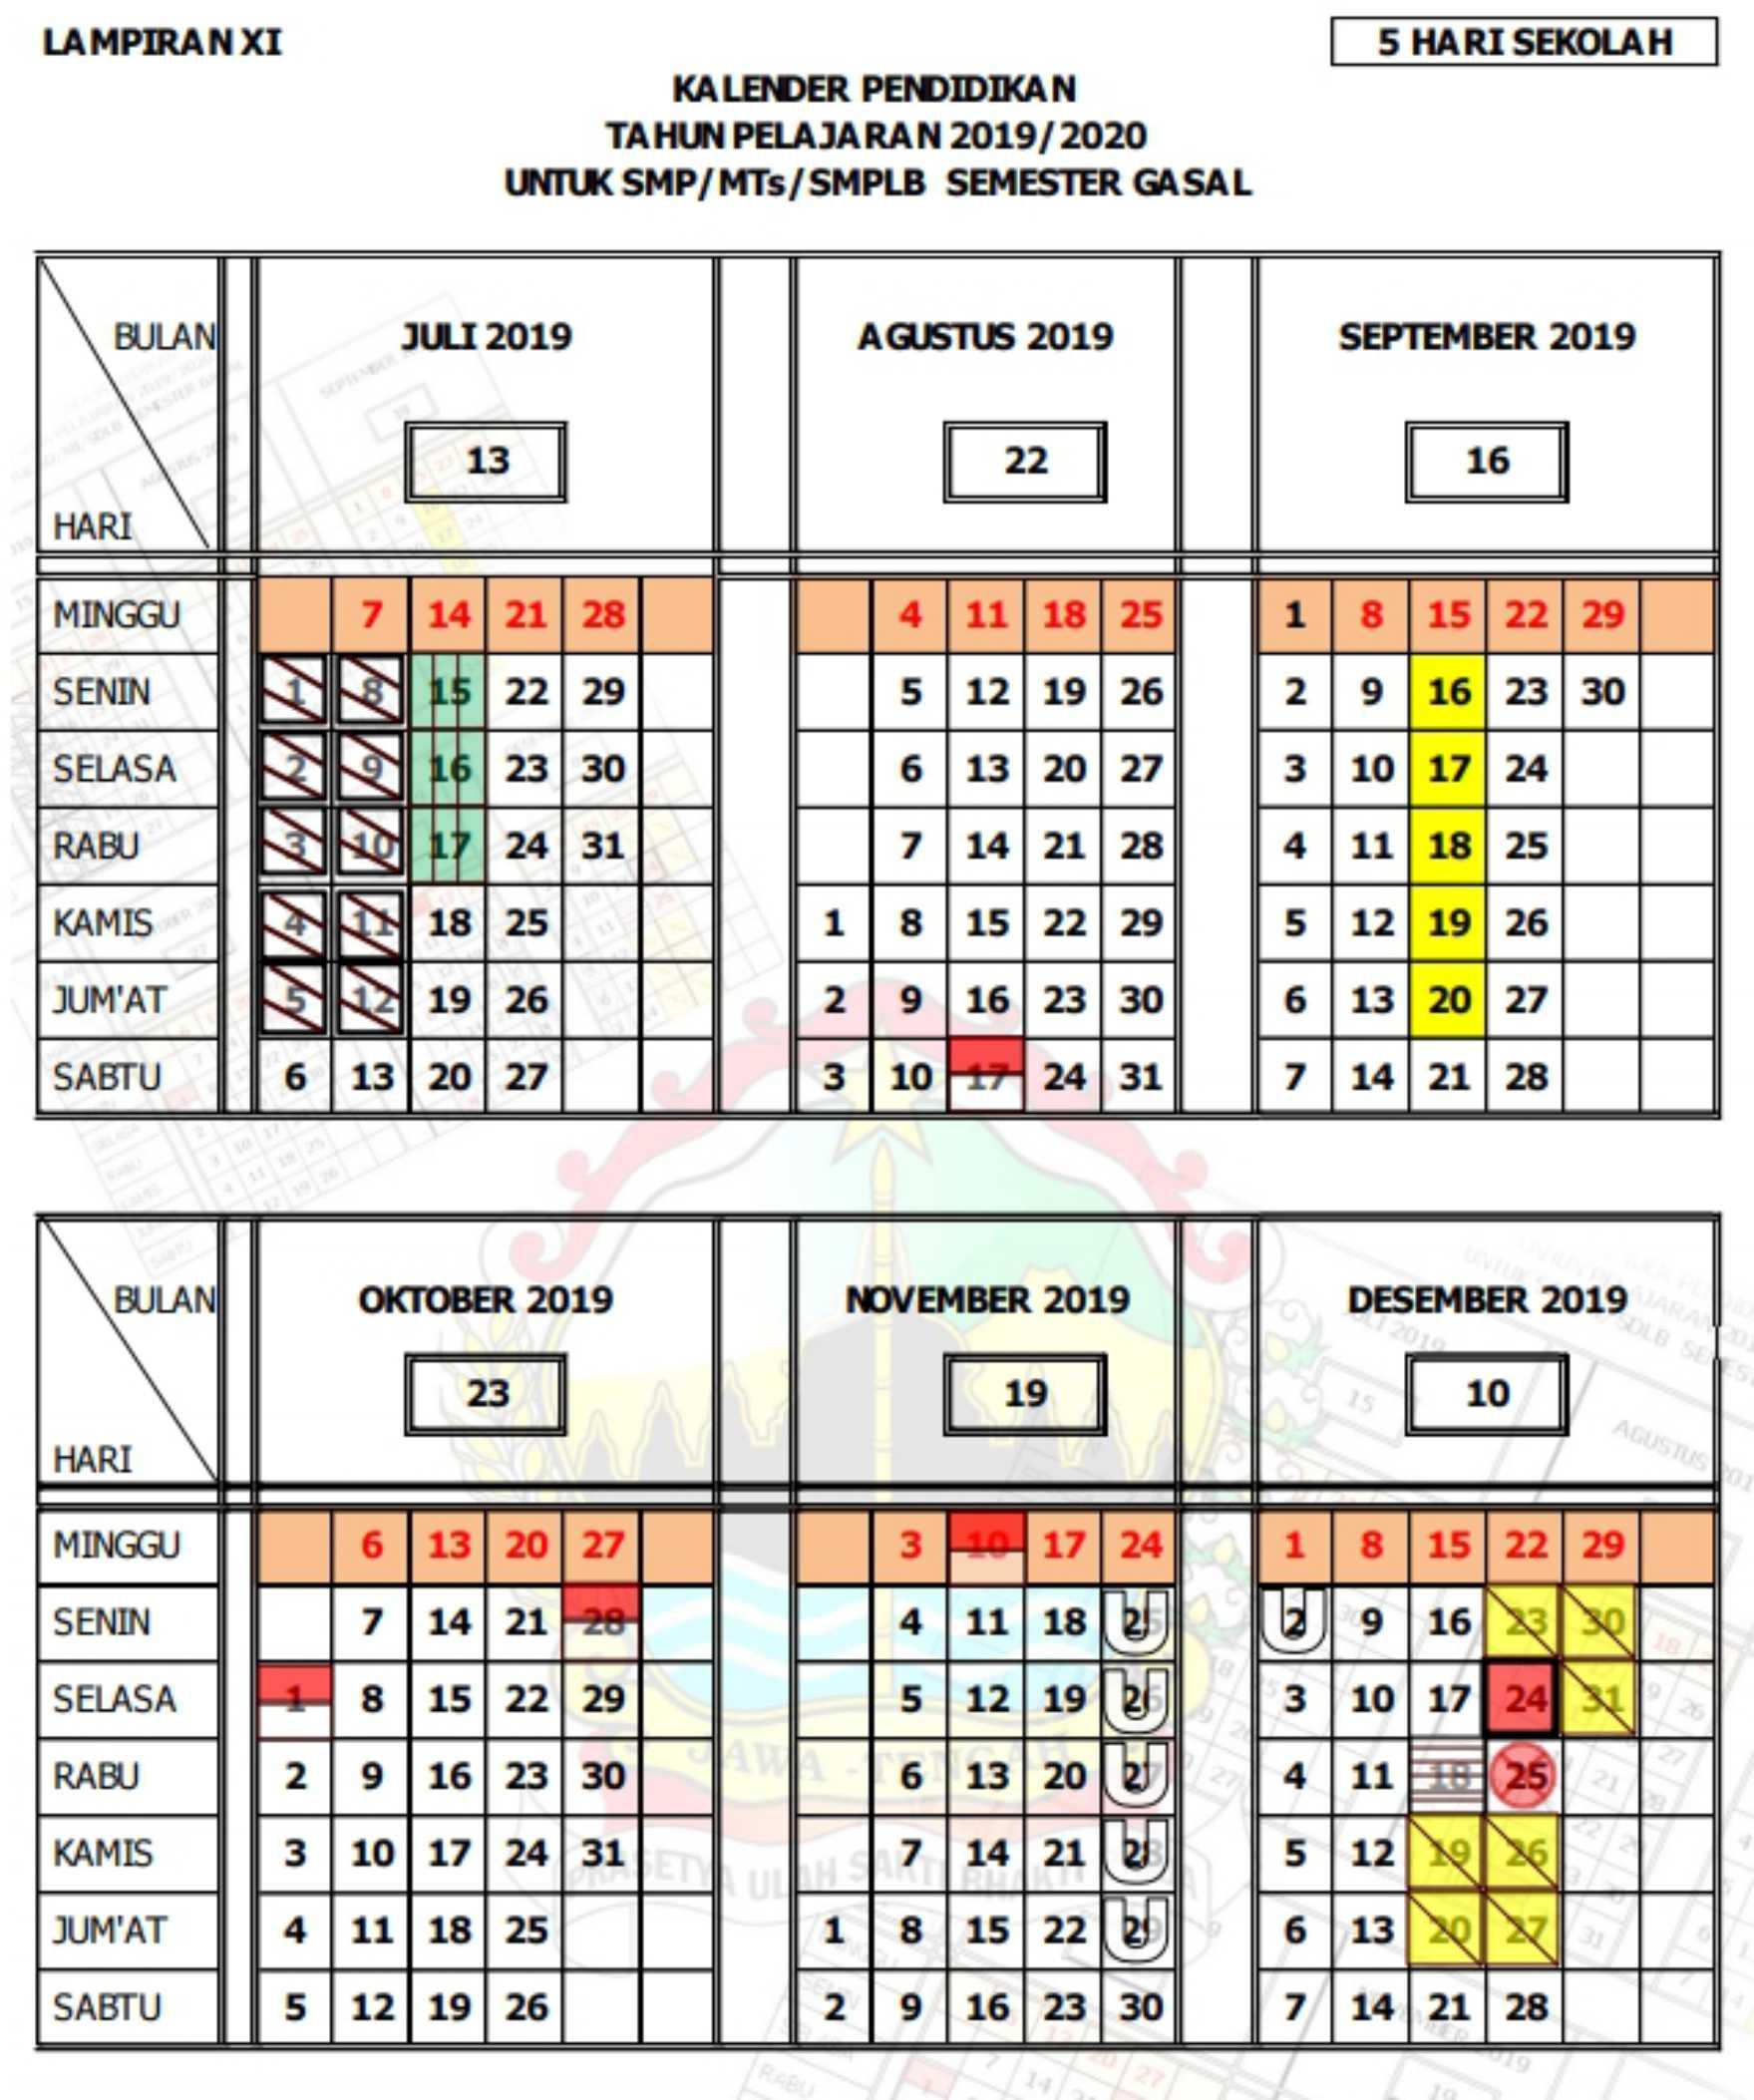 kalender pendidikan tahun pelajaran 2019 - 2020 semester gasal-ganjil SMP SMPLB MTs (5 hari sekolah) provinsi jawa tengah